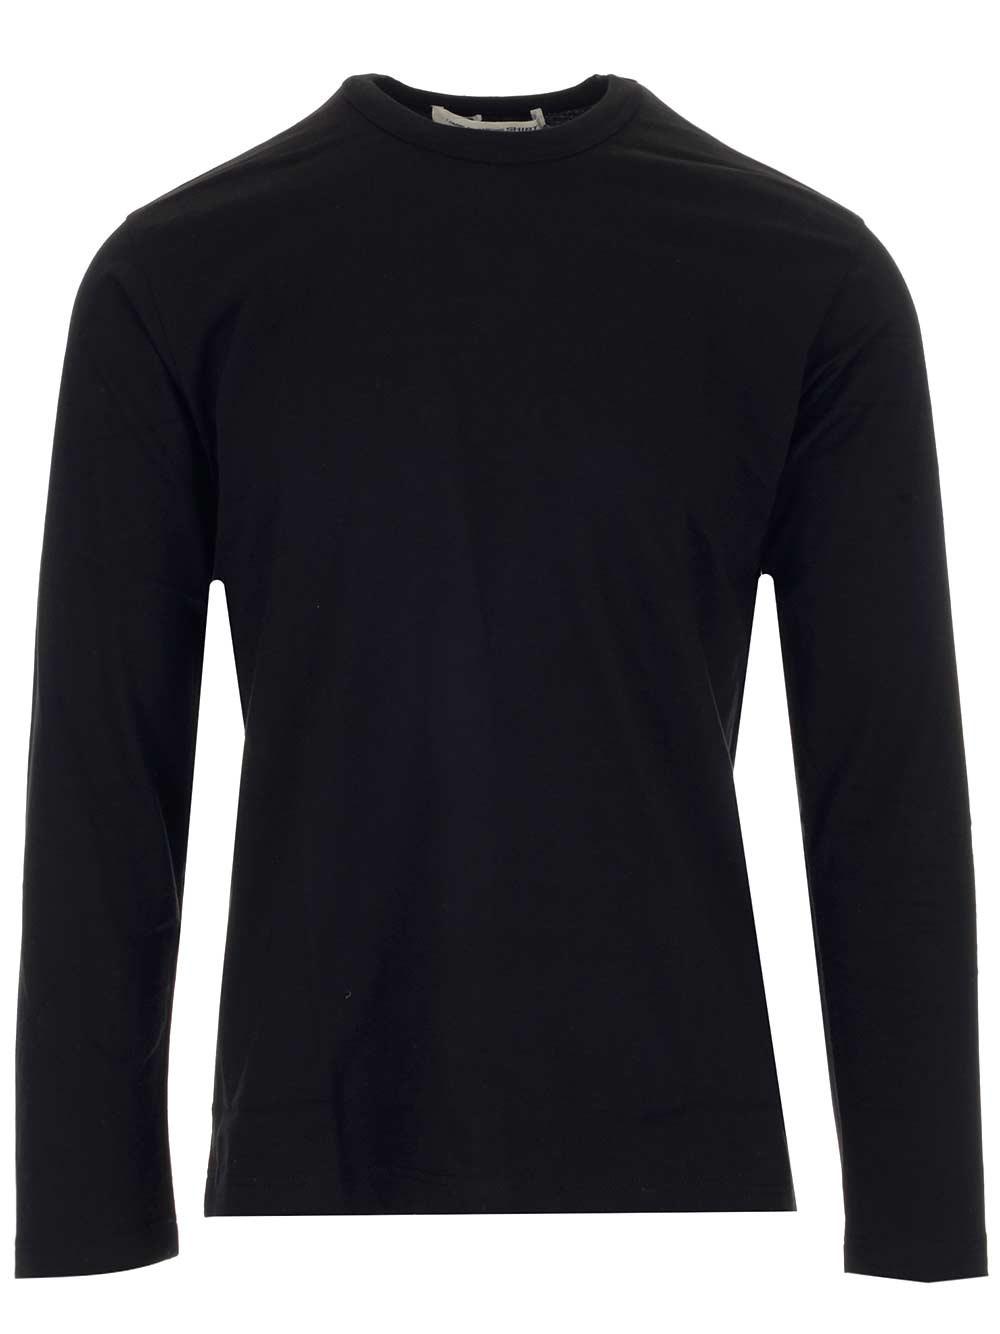 COMME DES GARCONS SHIRT Black Long-Sleeved T-Shirt